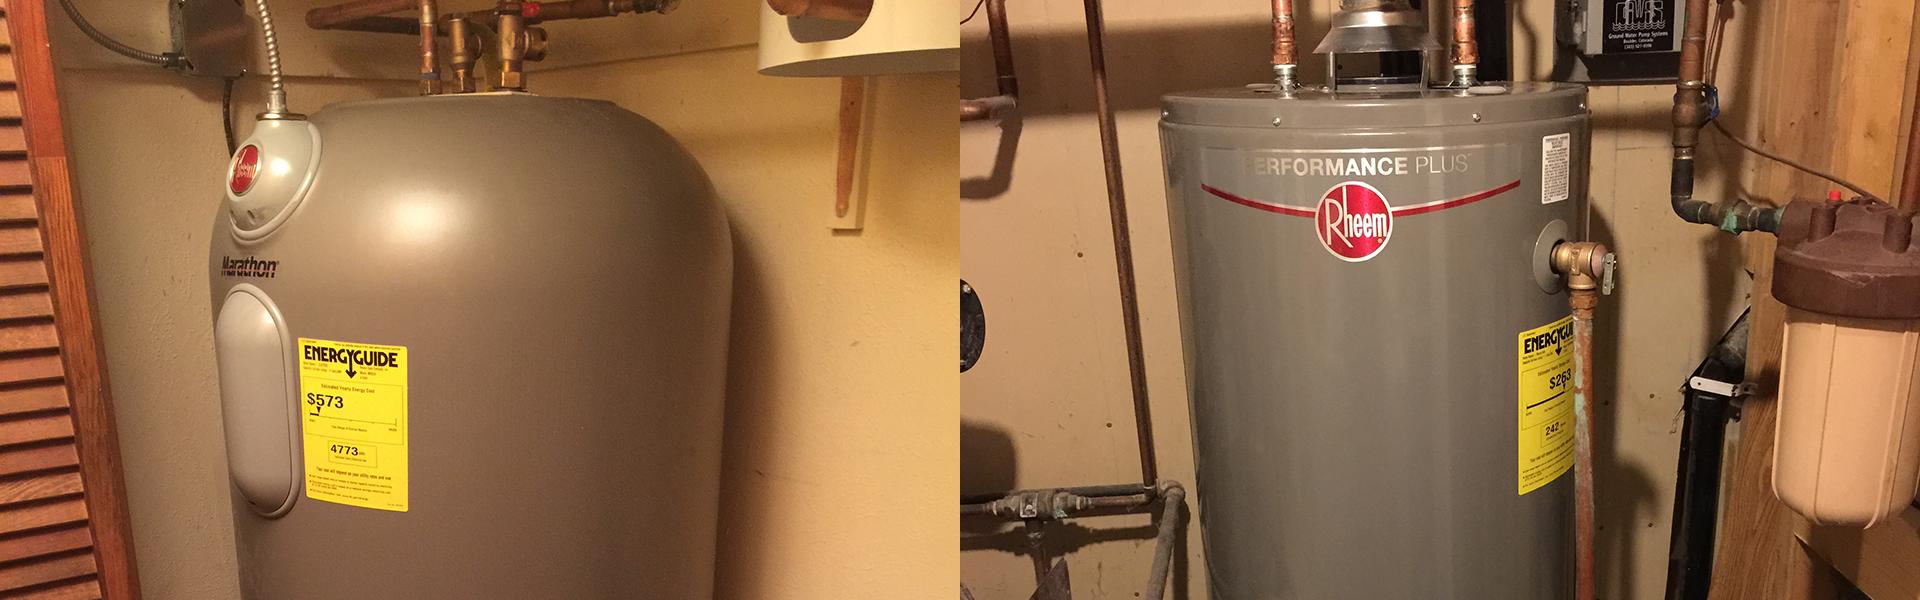 water heater replacement boulder longmont